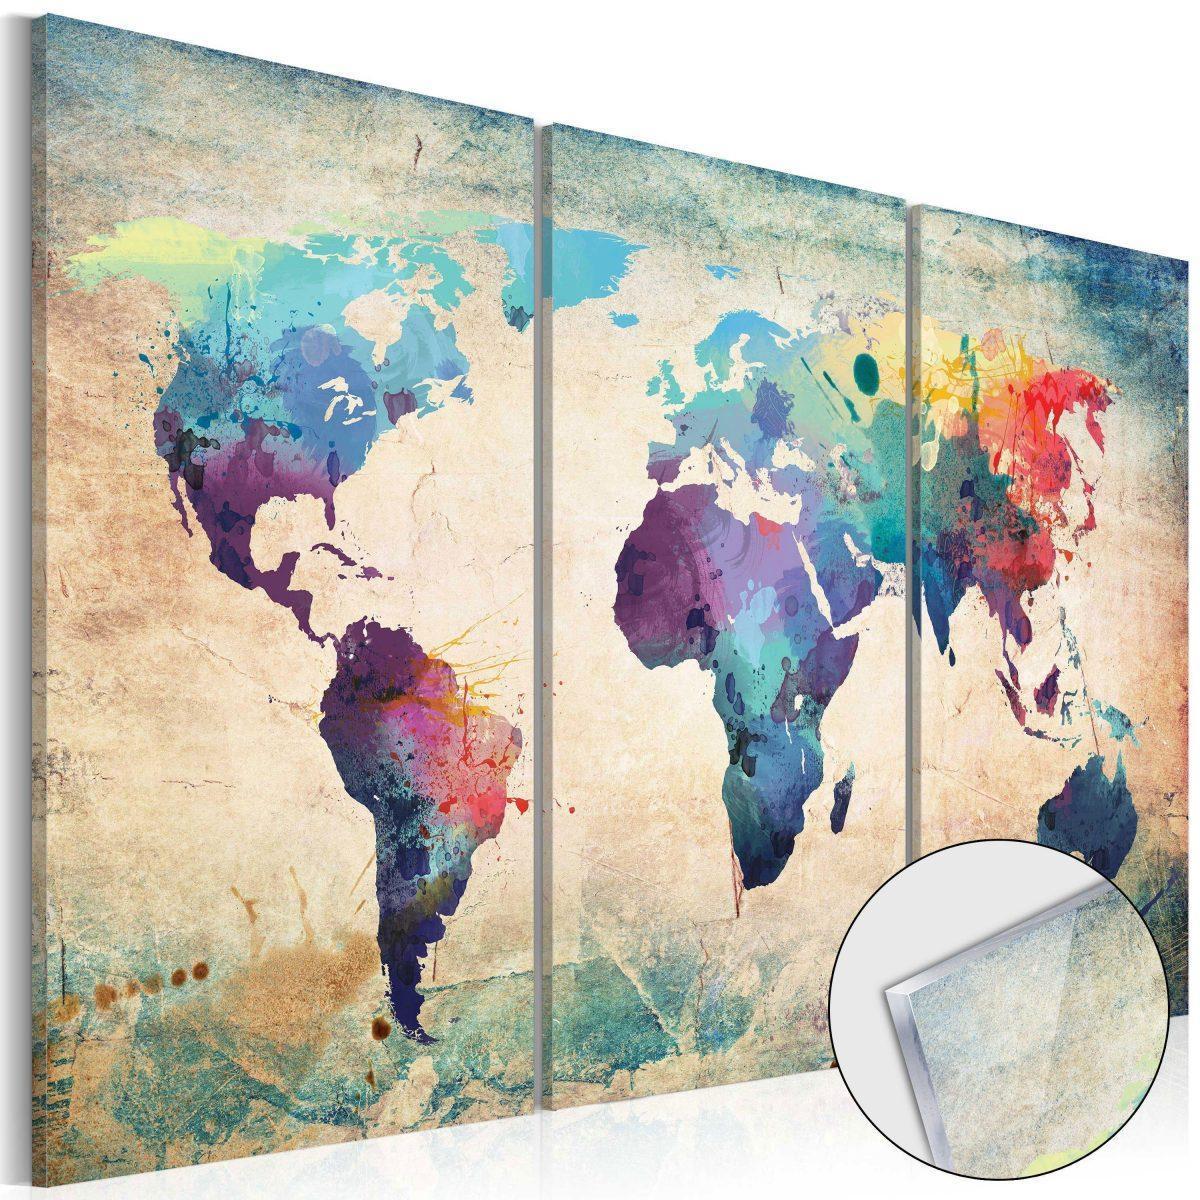 Tavla i akrylglas - Rainbow Map - 90x60